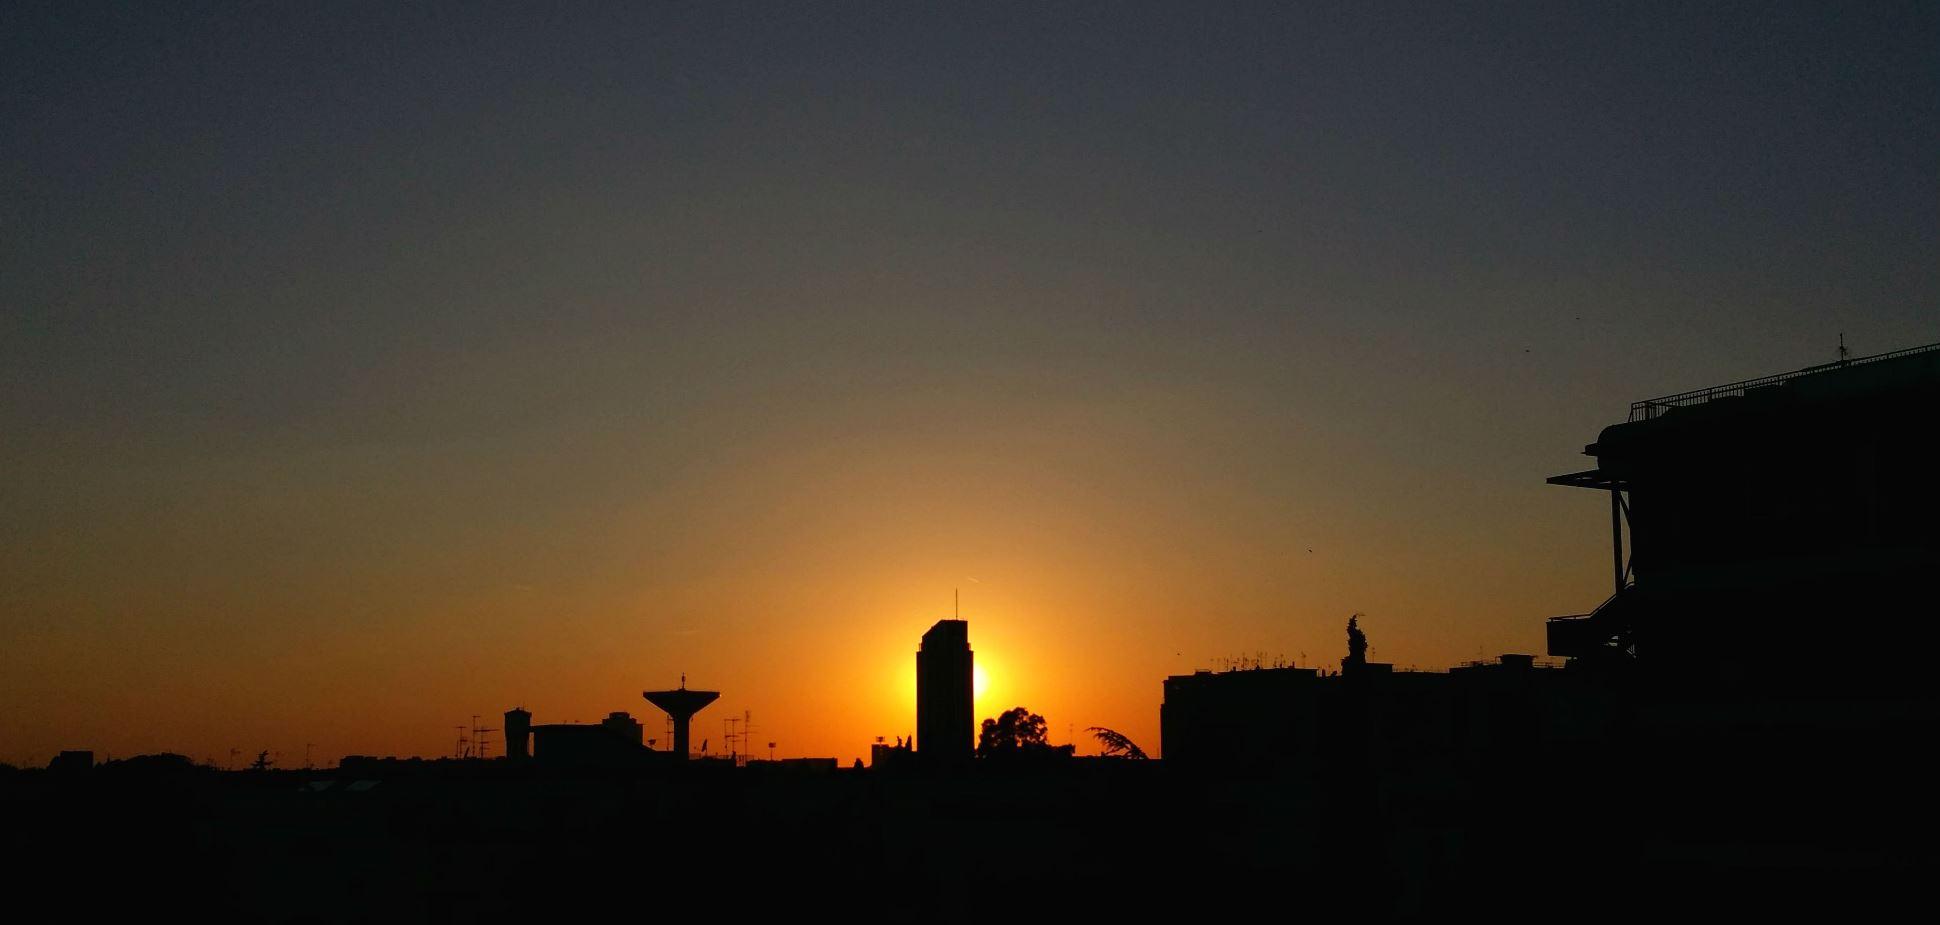 Tramonto in città foto di tramonti skyline tramonto a latina foto di tramonto città al tramonto immagini di tramonti bellissimi immagine di un tramonto a Latina migliore tramonti scattati